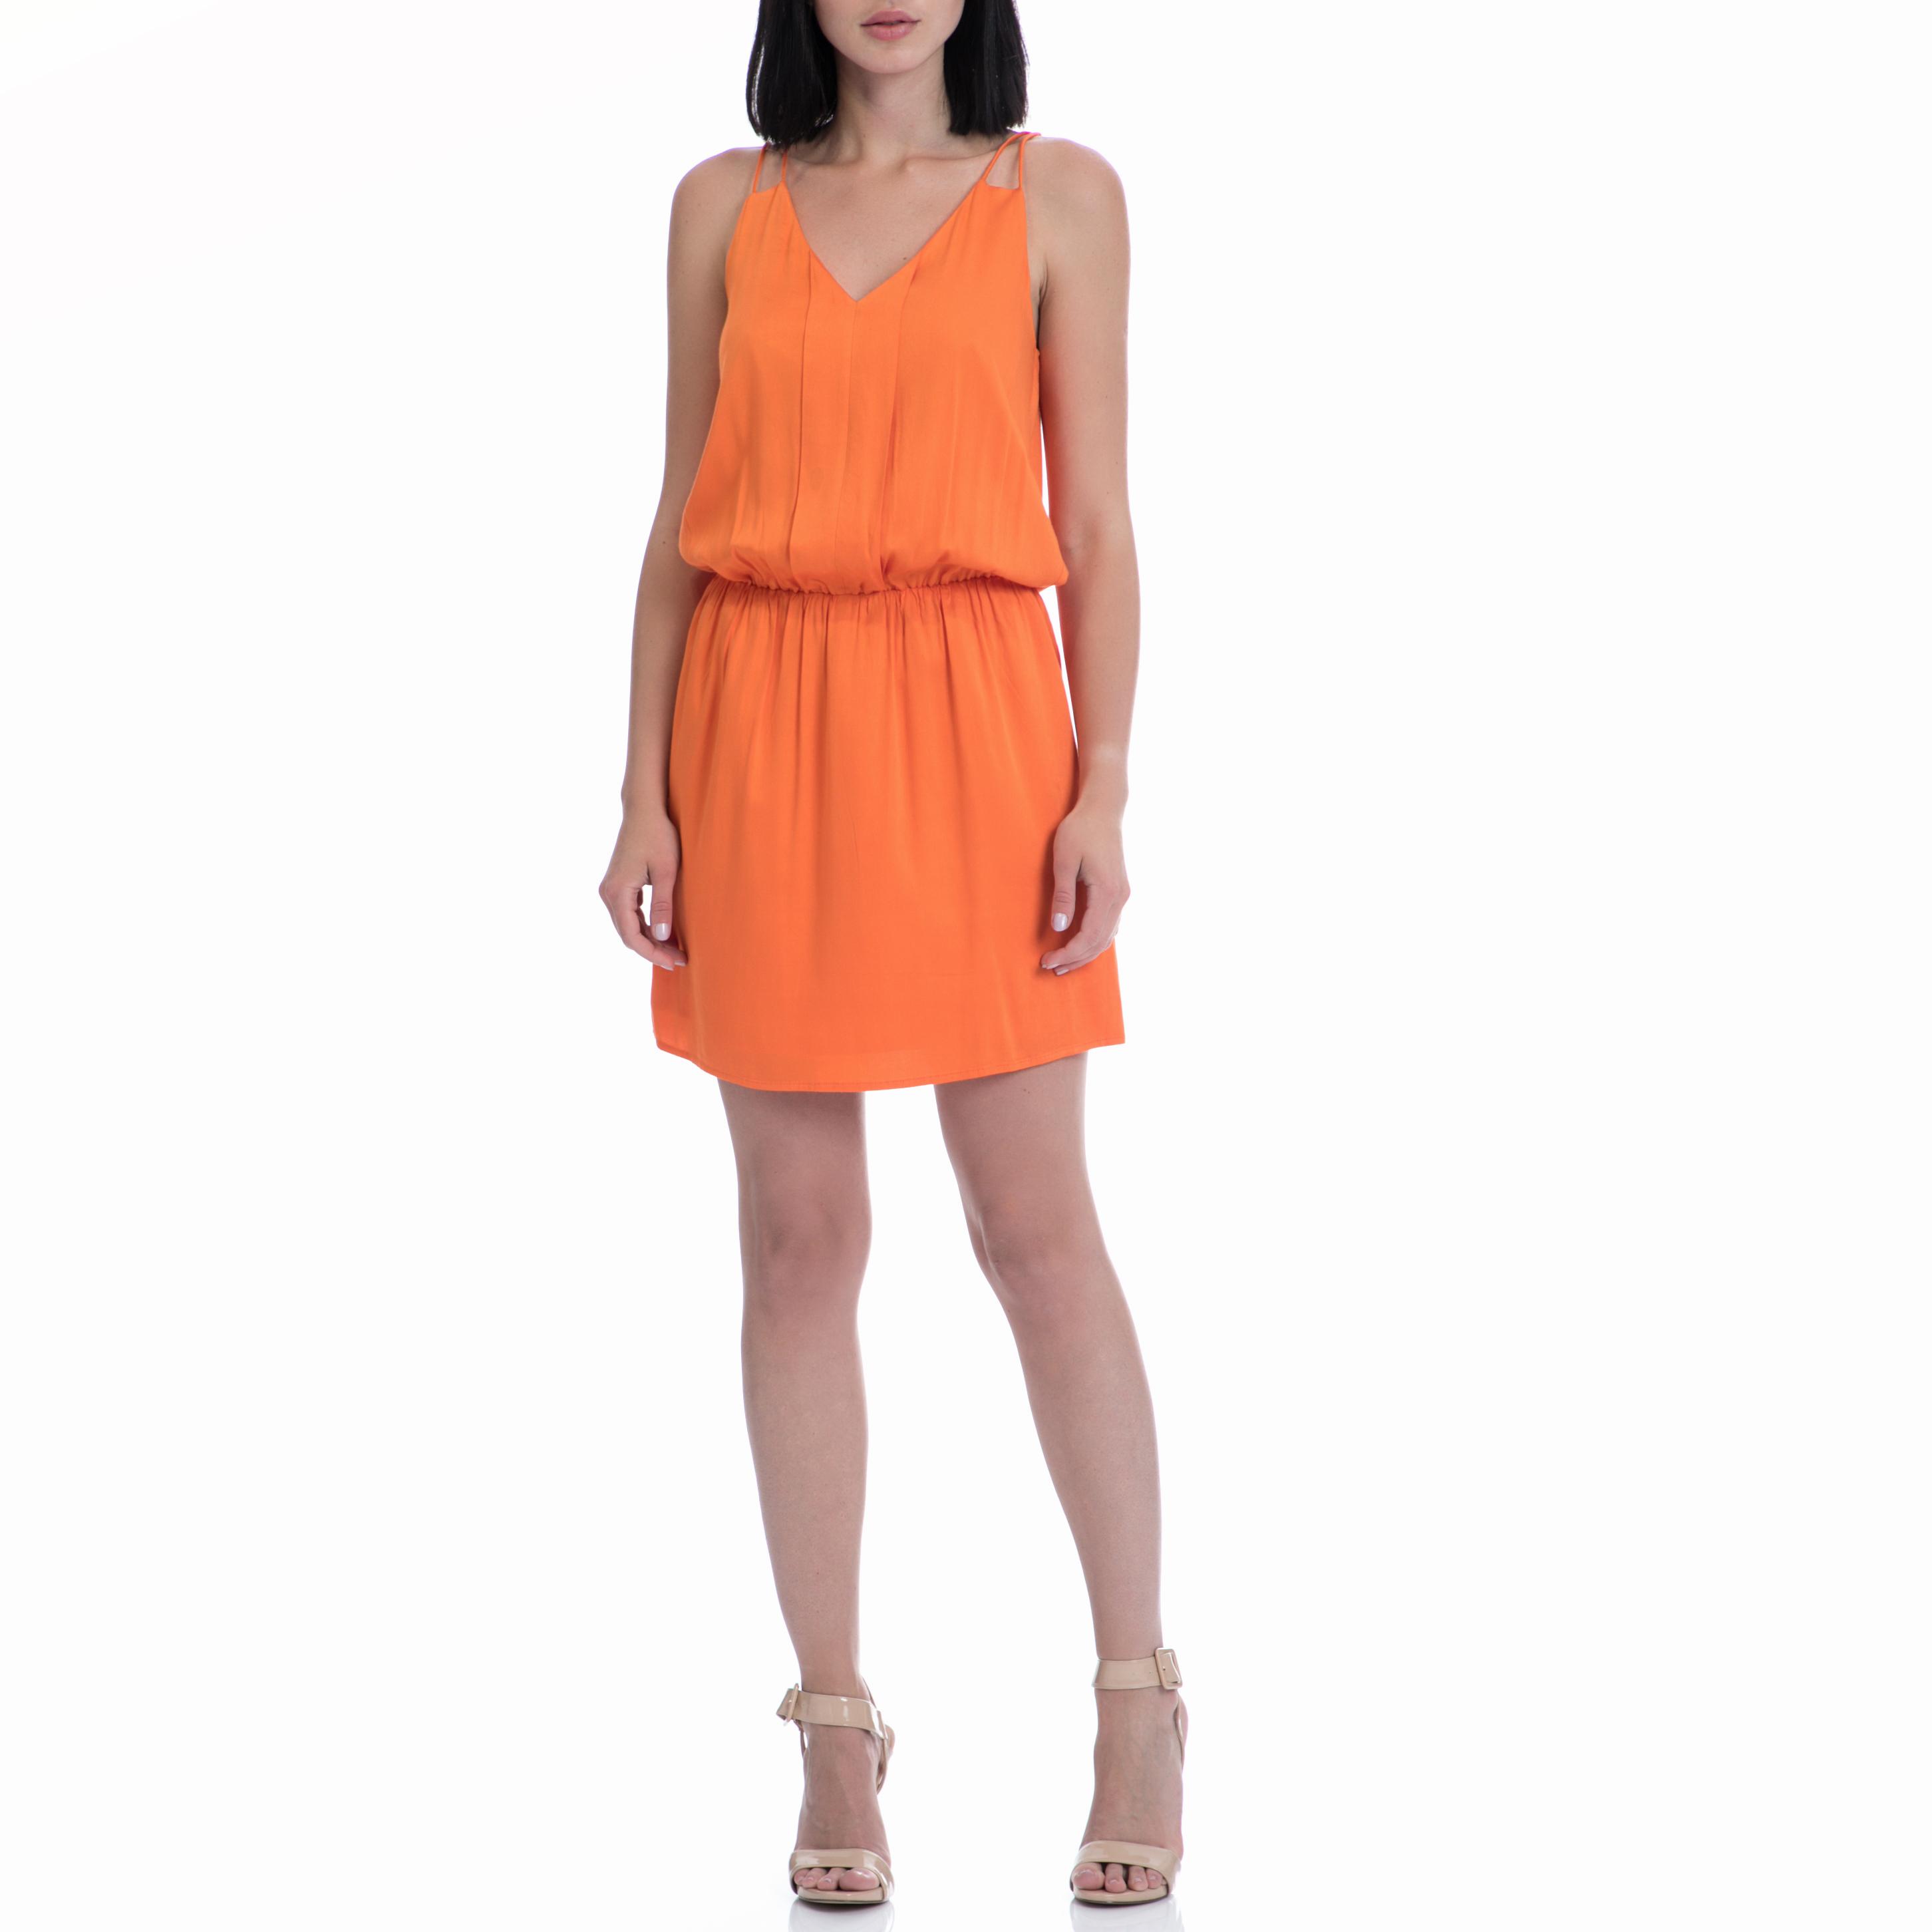 MOTIVI - Φόρεμα MOTIVI πορτοκαλί γυναικεία ρούχα φορέματα μίνι